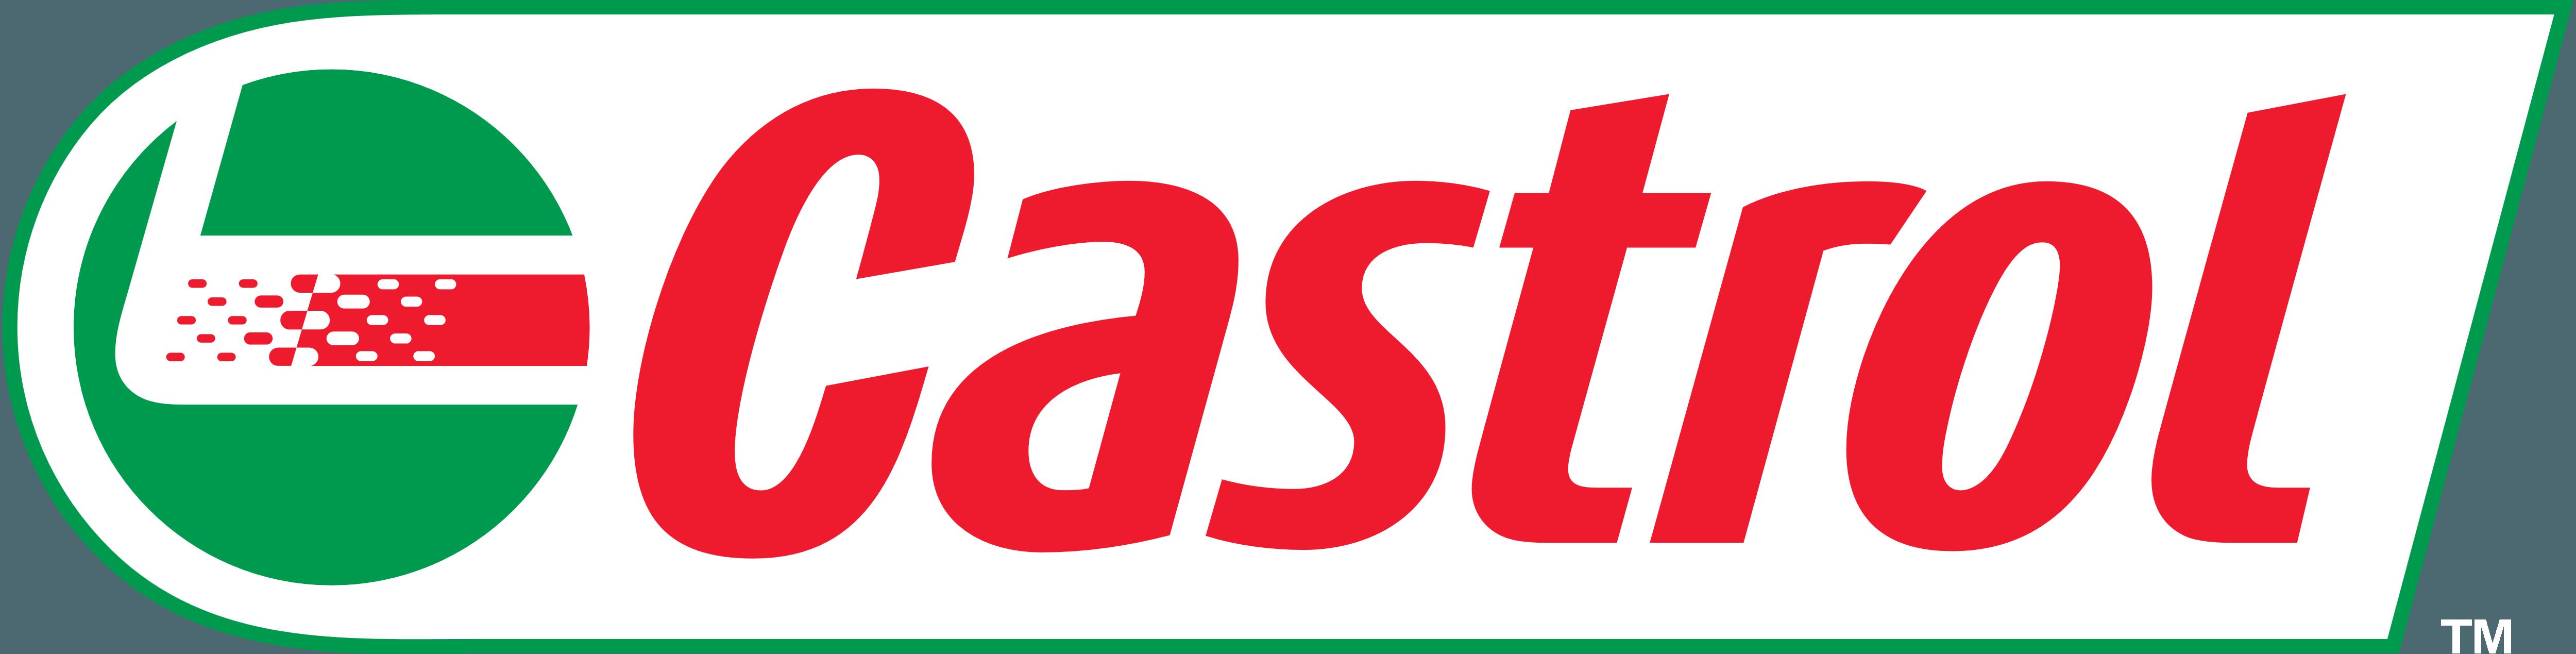 Castrol partnership